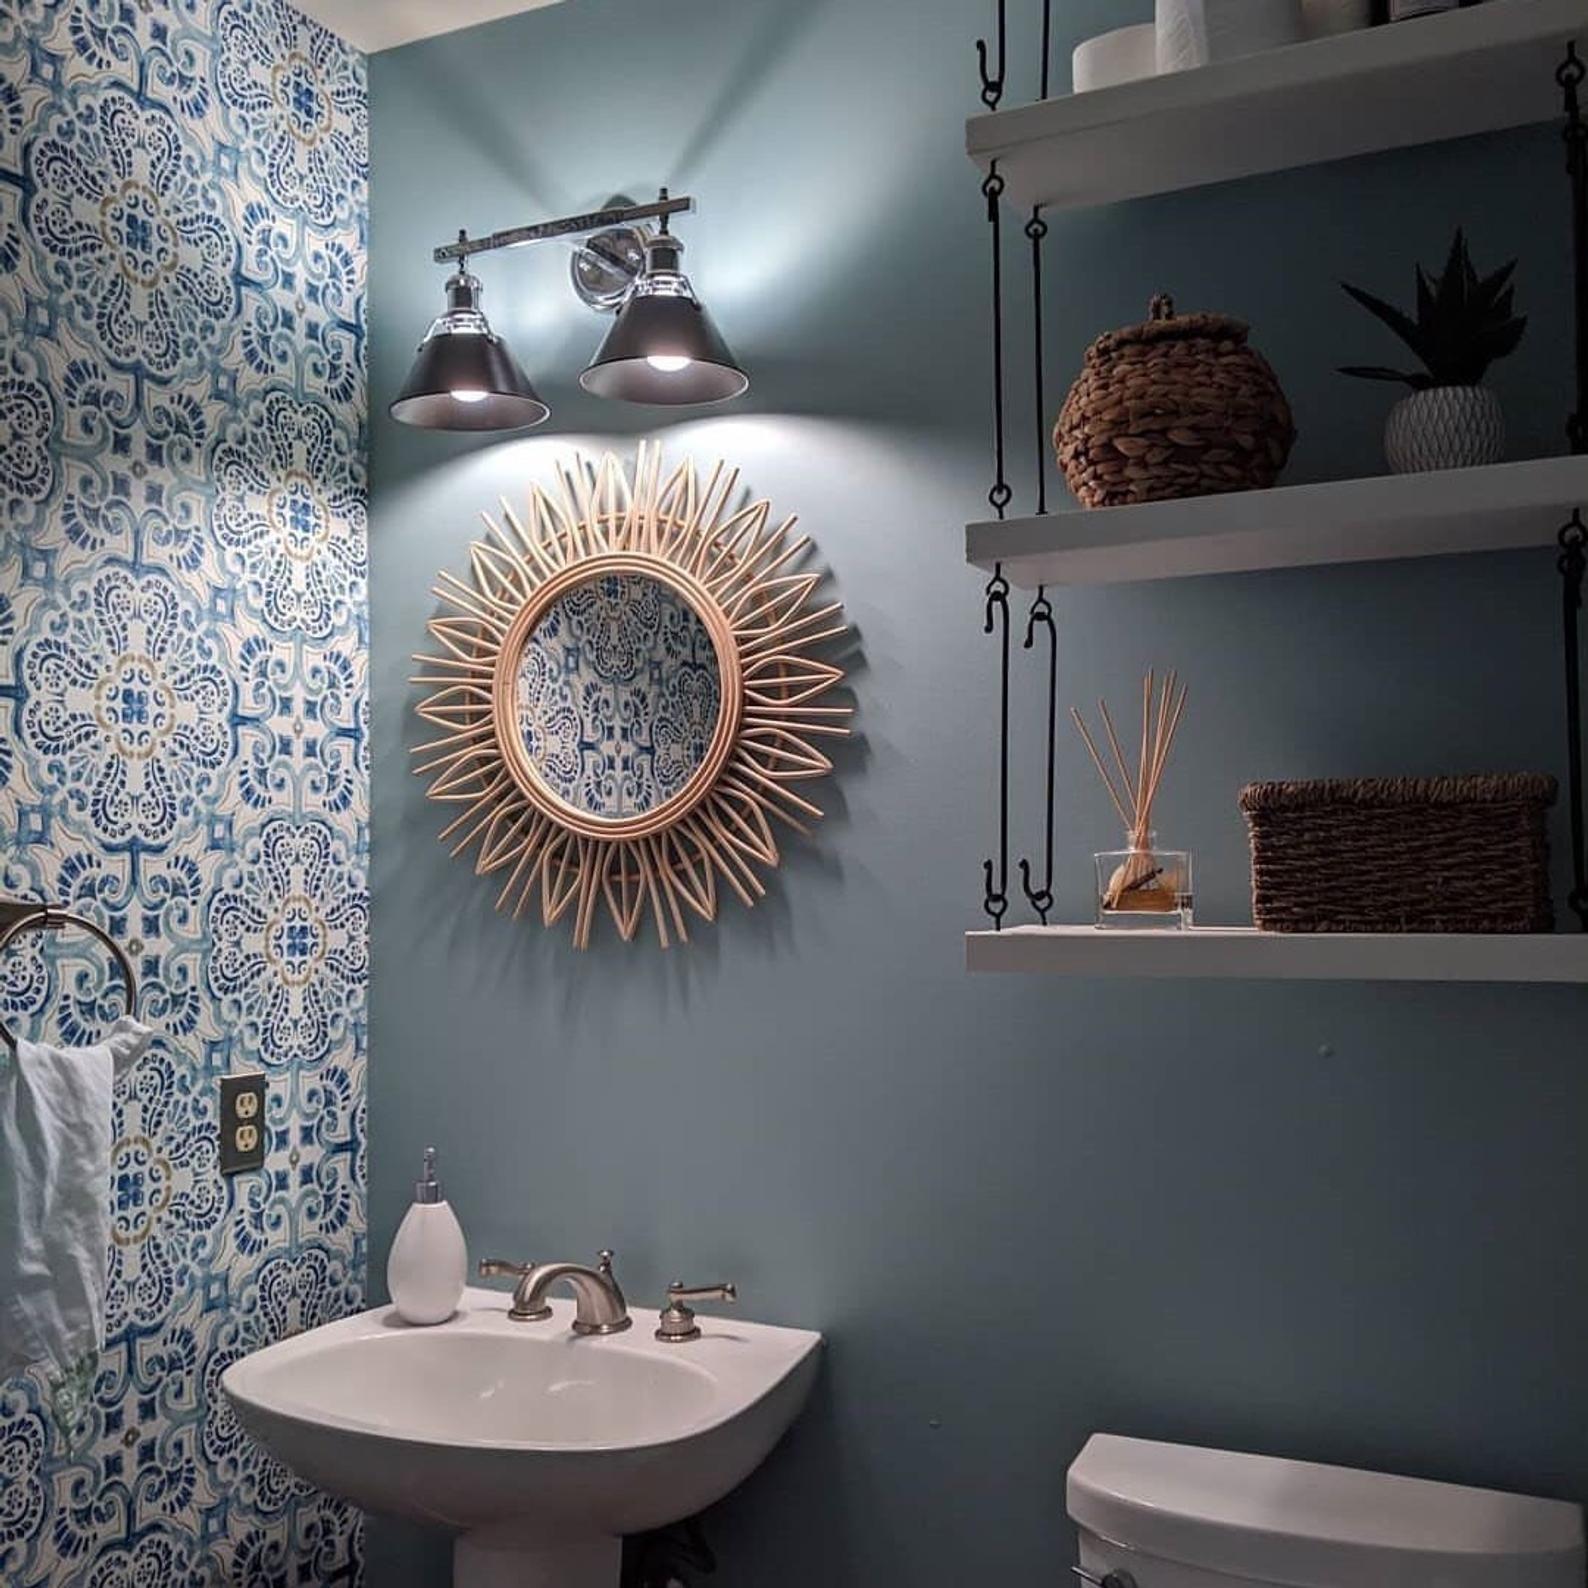 Peel And Stick Vintage Chic Blue Florentine Medallion Tile Etsy Peel And Stick Wallpaper Vintage Chic Tile Wallpaper